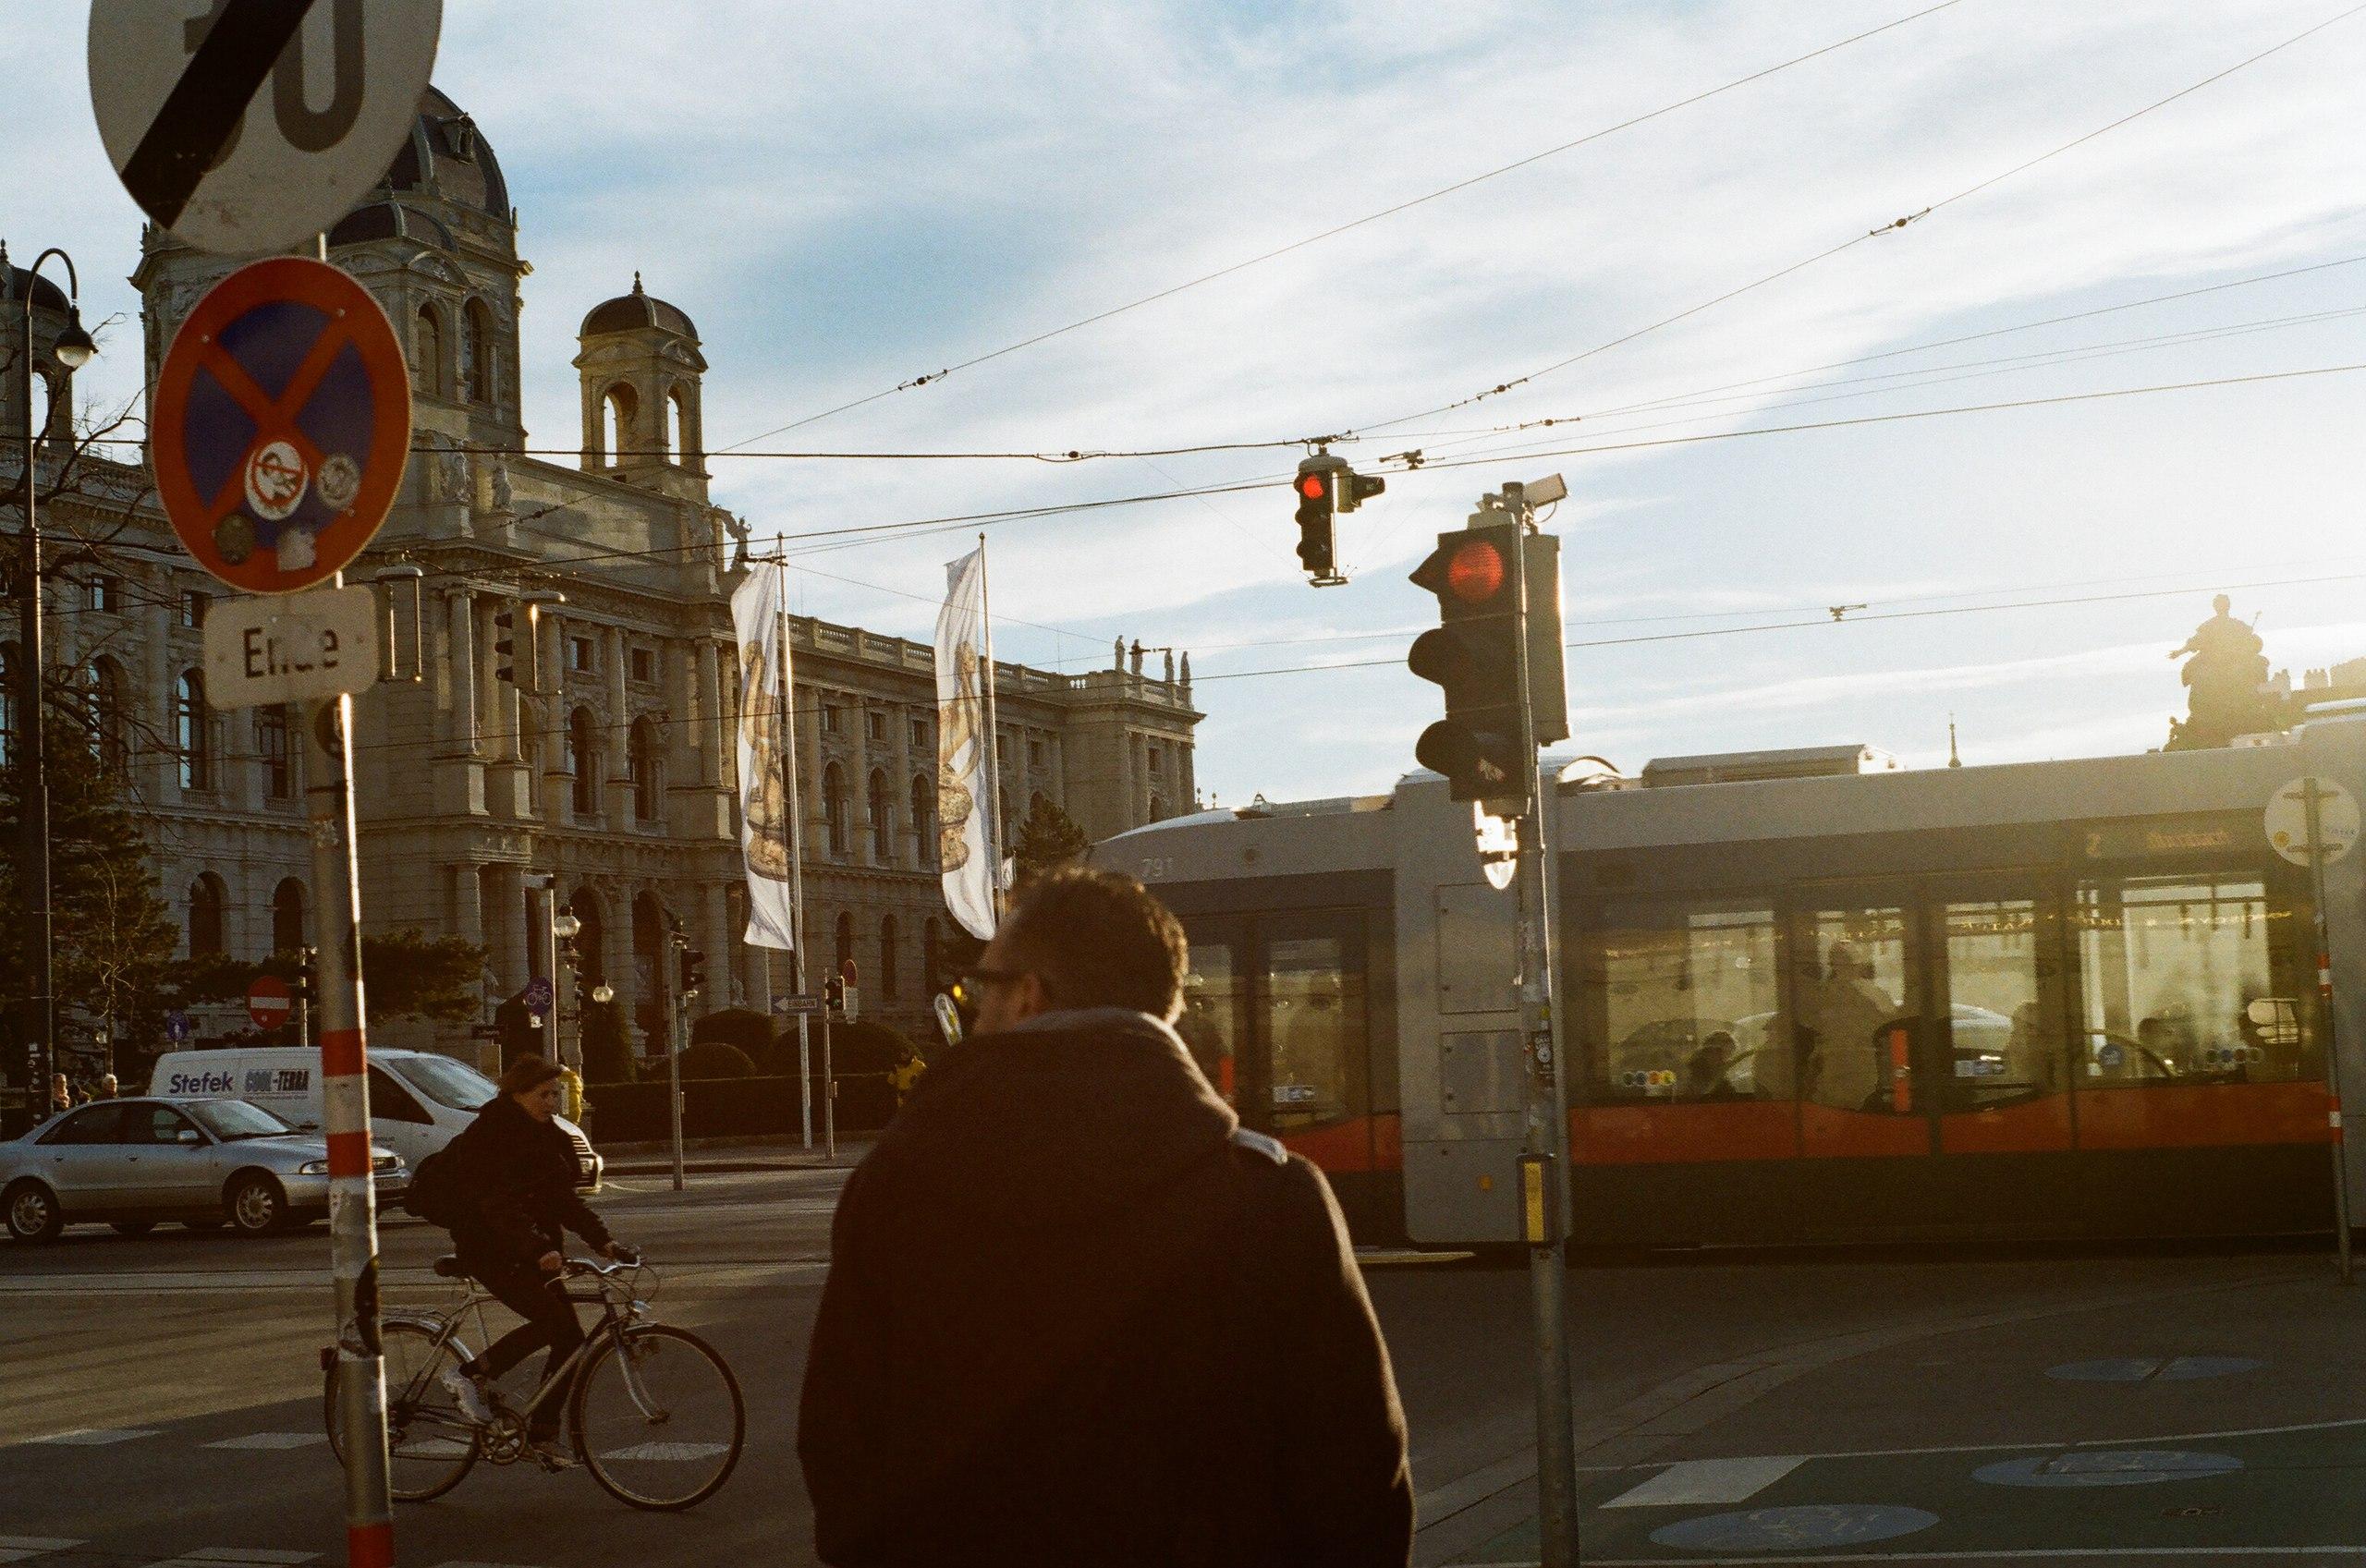 ємиграция Австрия Переехали: как жить в Австрии? DlhI4ZggHGM